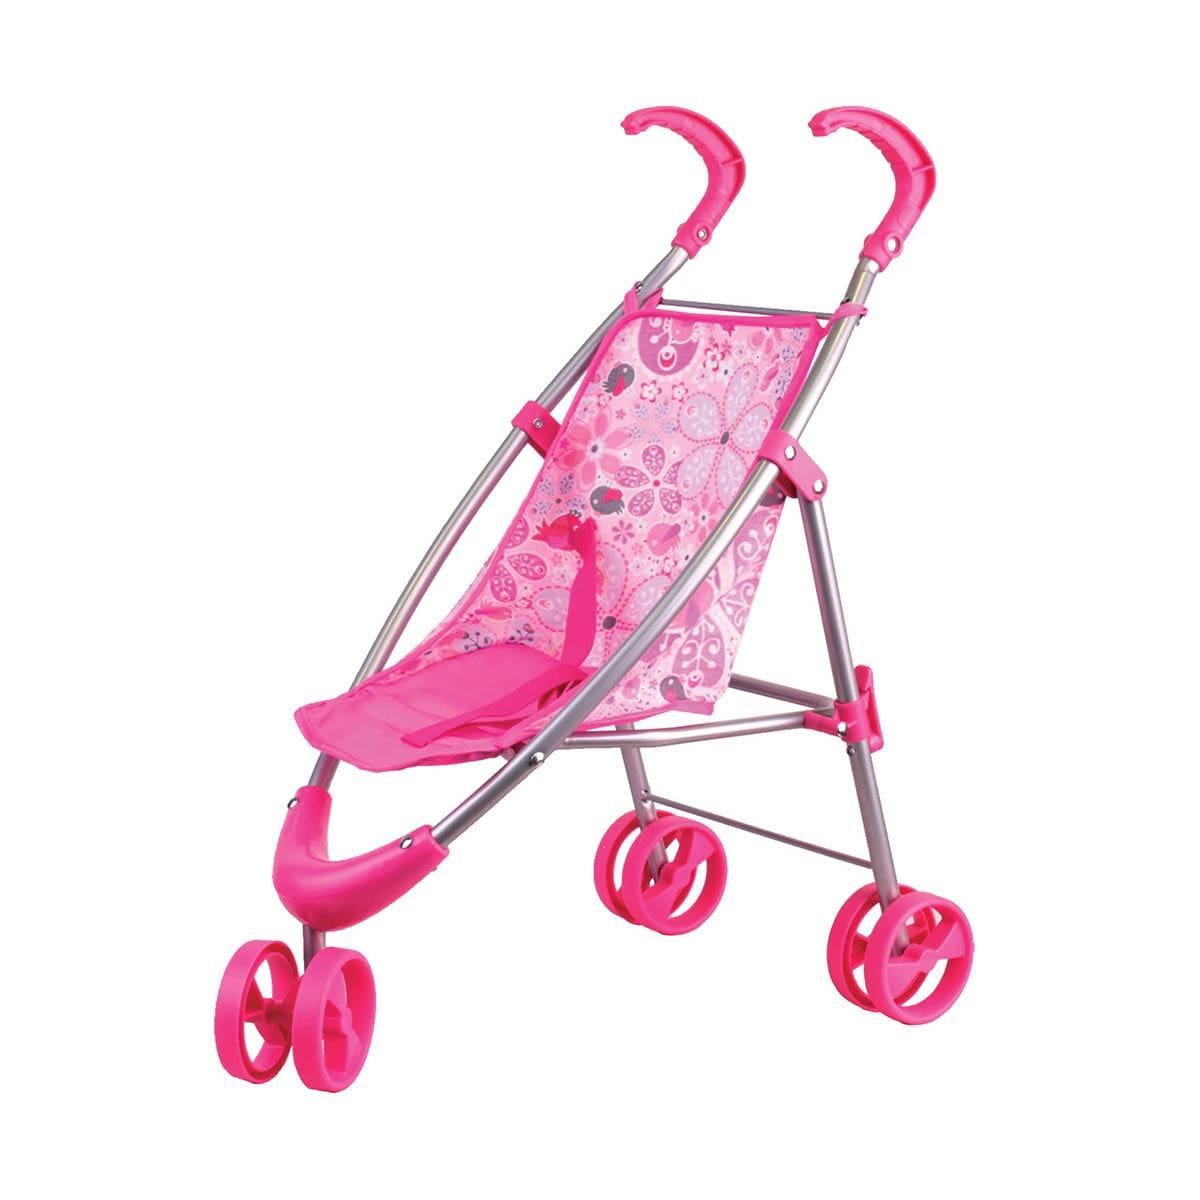 Прогулочная коляска для кукол Gulliver 22-12030 с вращающимися колесами - розовая